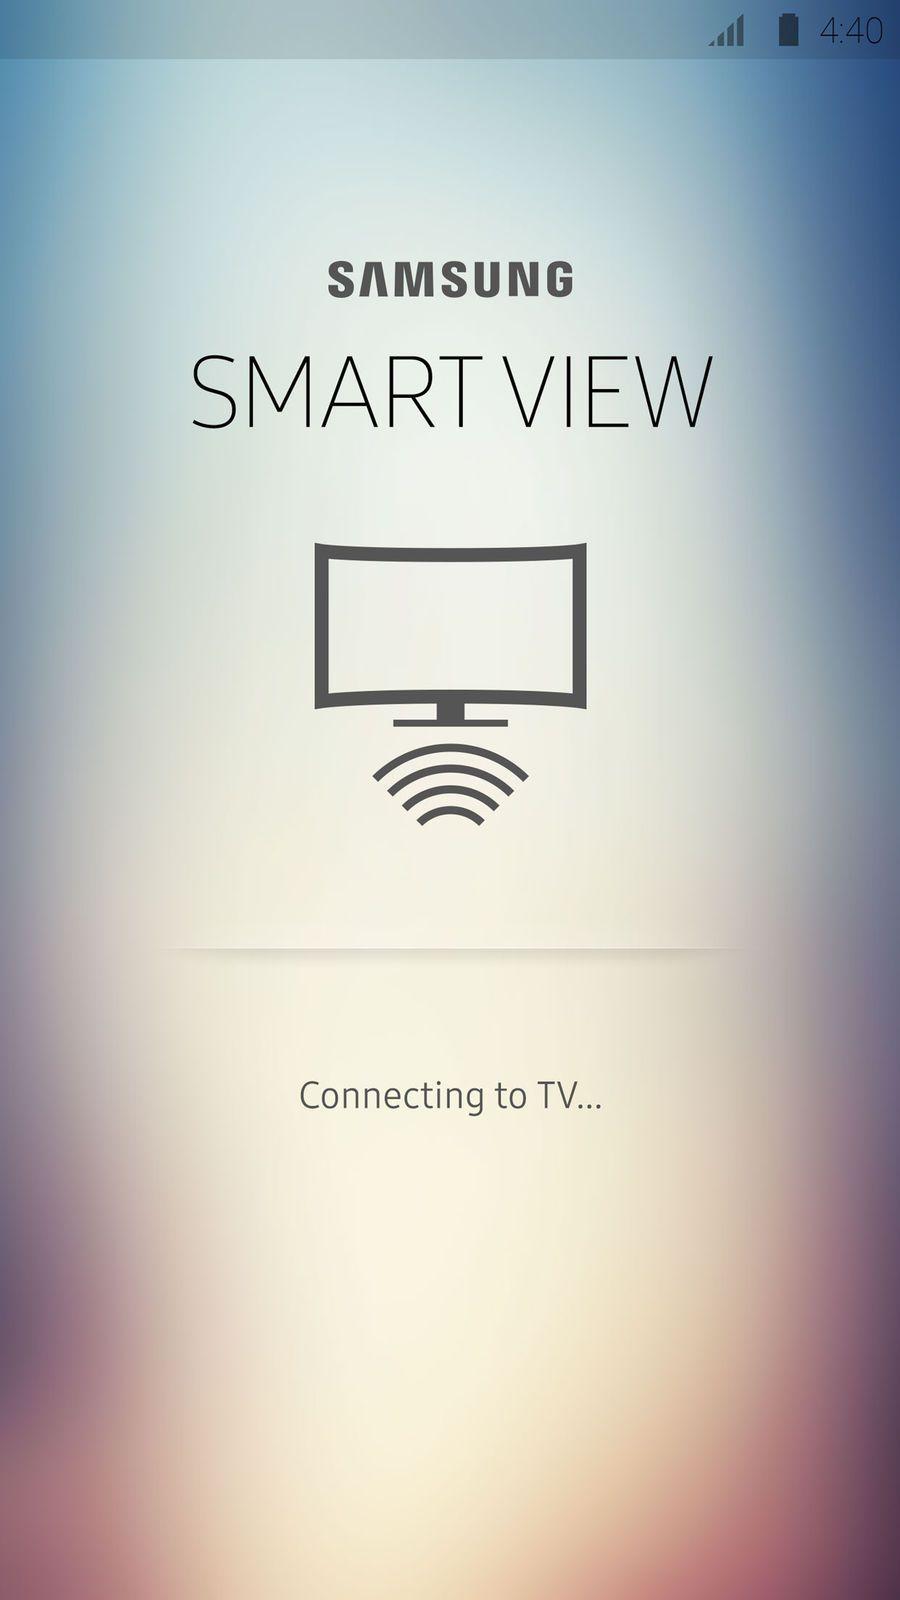 images?q=tbn:ANd9GcQh_l3eQ5xwiPy07kGEXjmjgmBKBRB7H2mRxCGhv1tFWg5c_mWT Smart View Pc To Tv